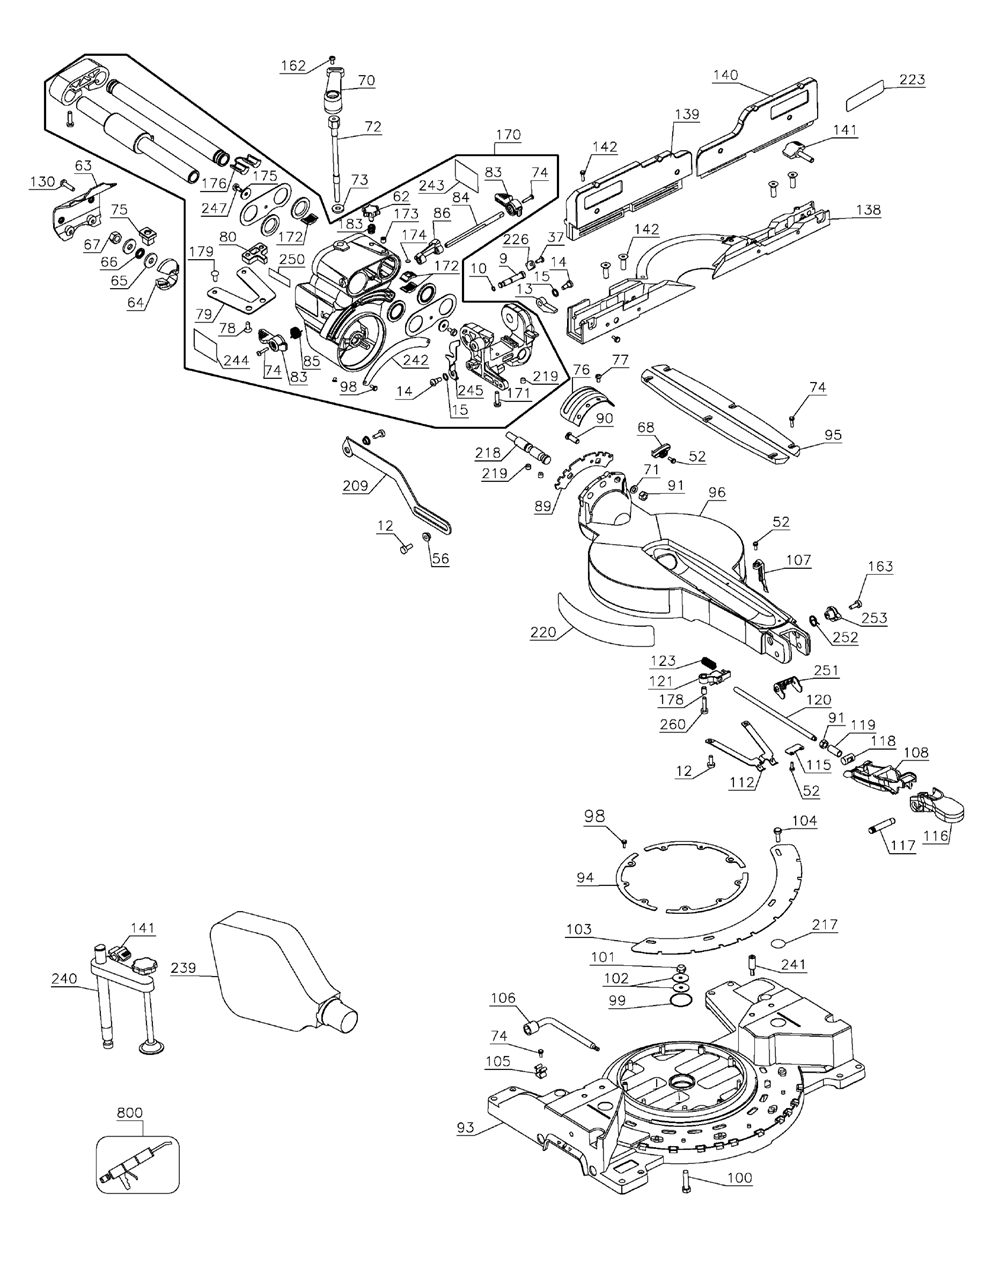 DW717-T2-Dewalt-PB-1Break Down